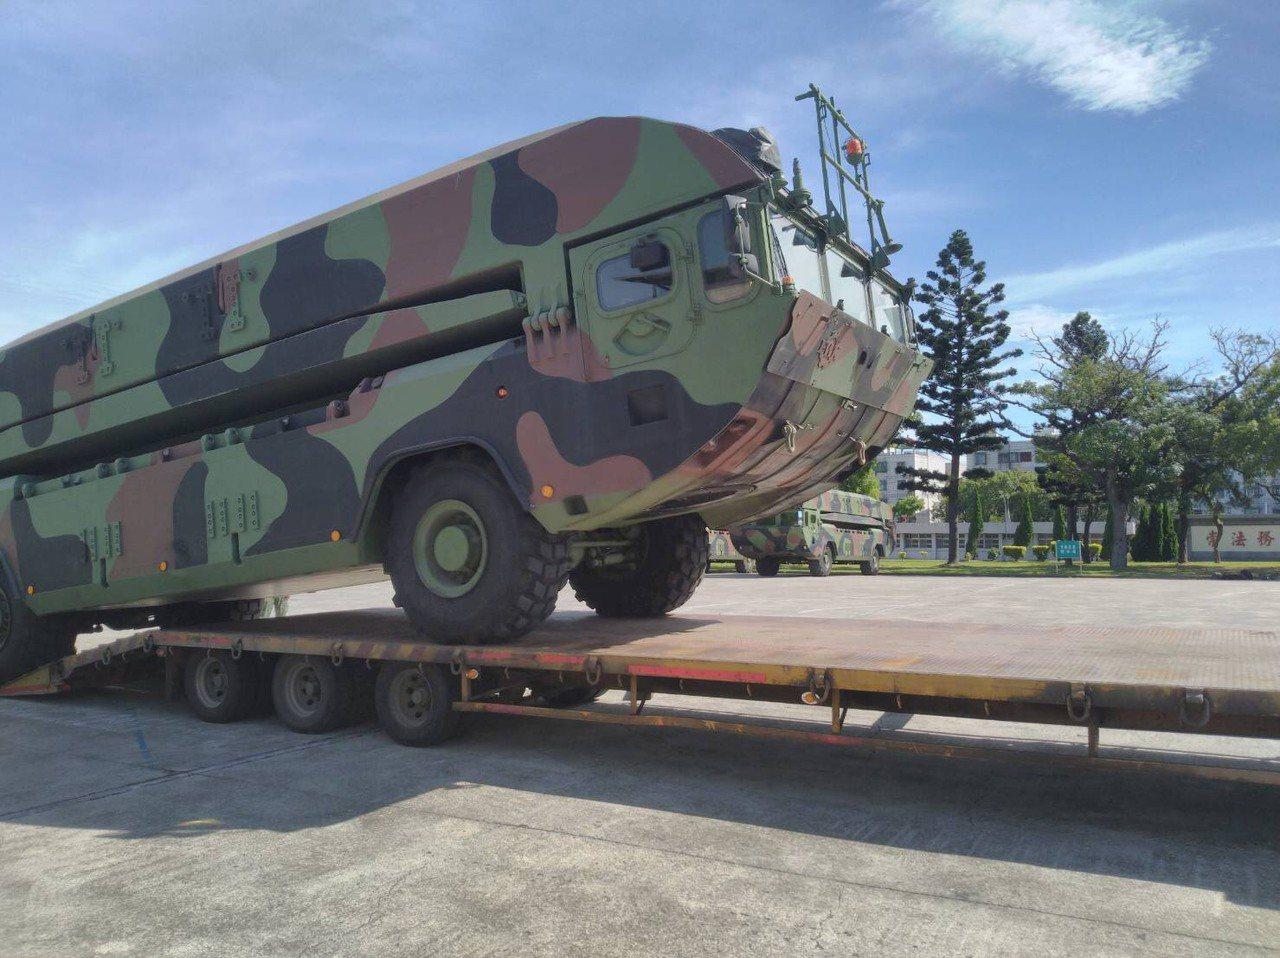 M3浮門橋車駛上板車,預備趕往南方澳現場。圖/陸軍提供